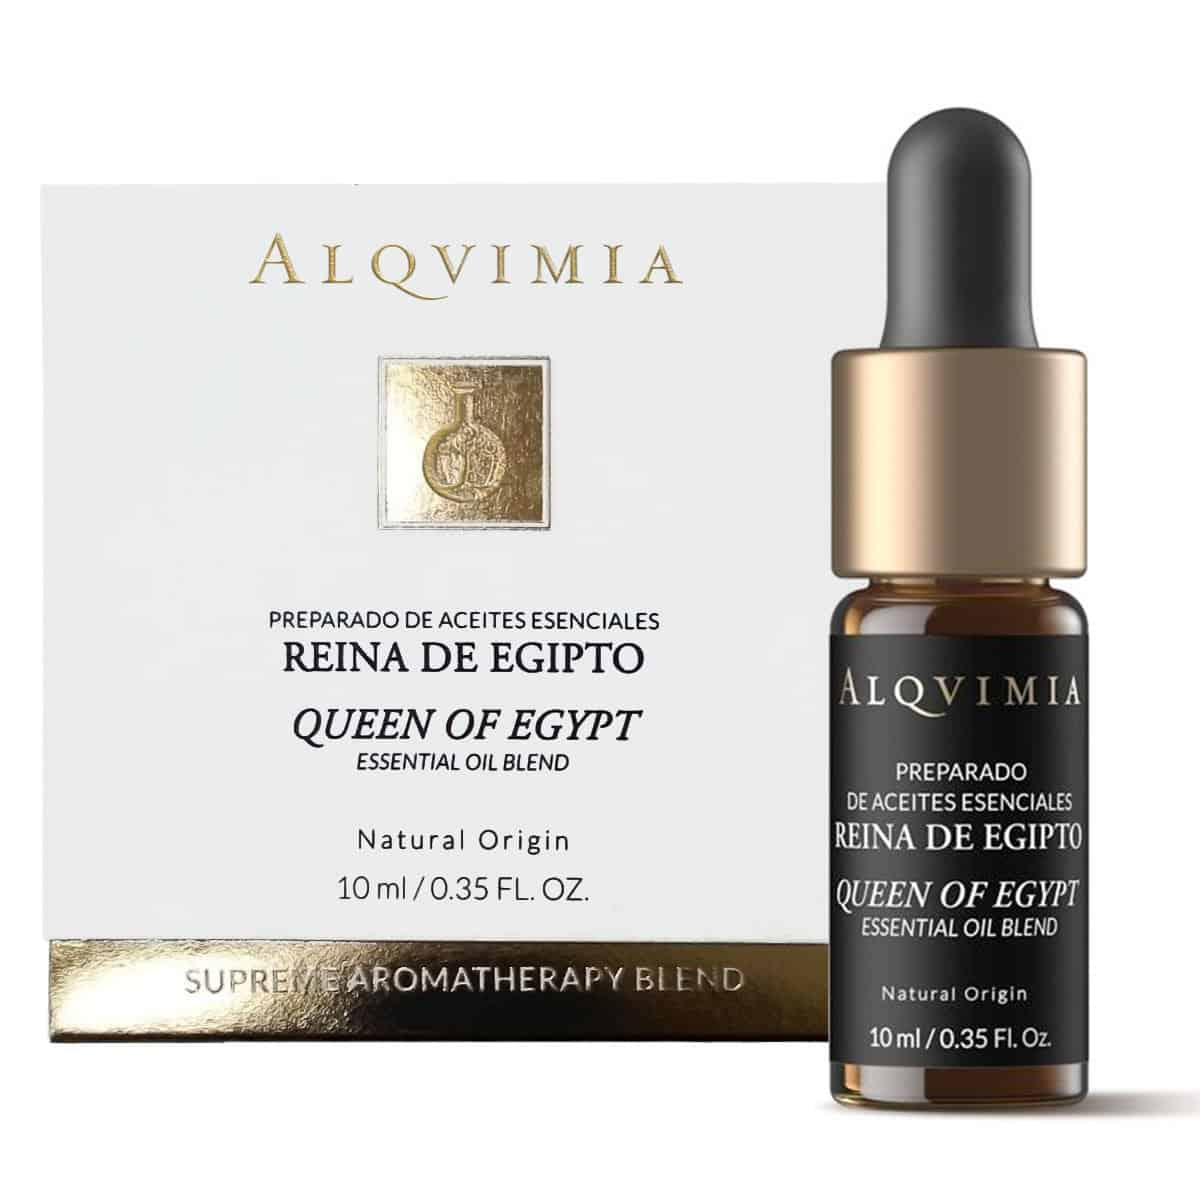 Alqvimia Preparado de Aceites Esenciales Reina de Egipto 10 ml